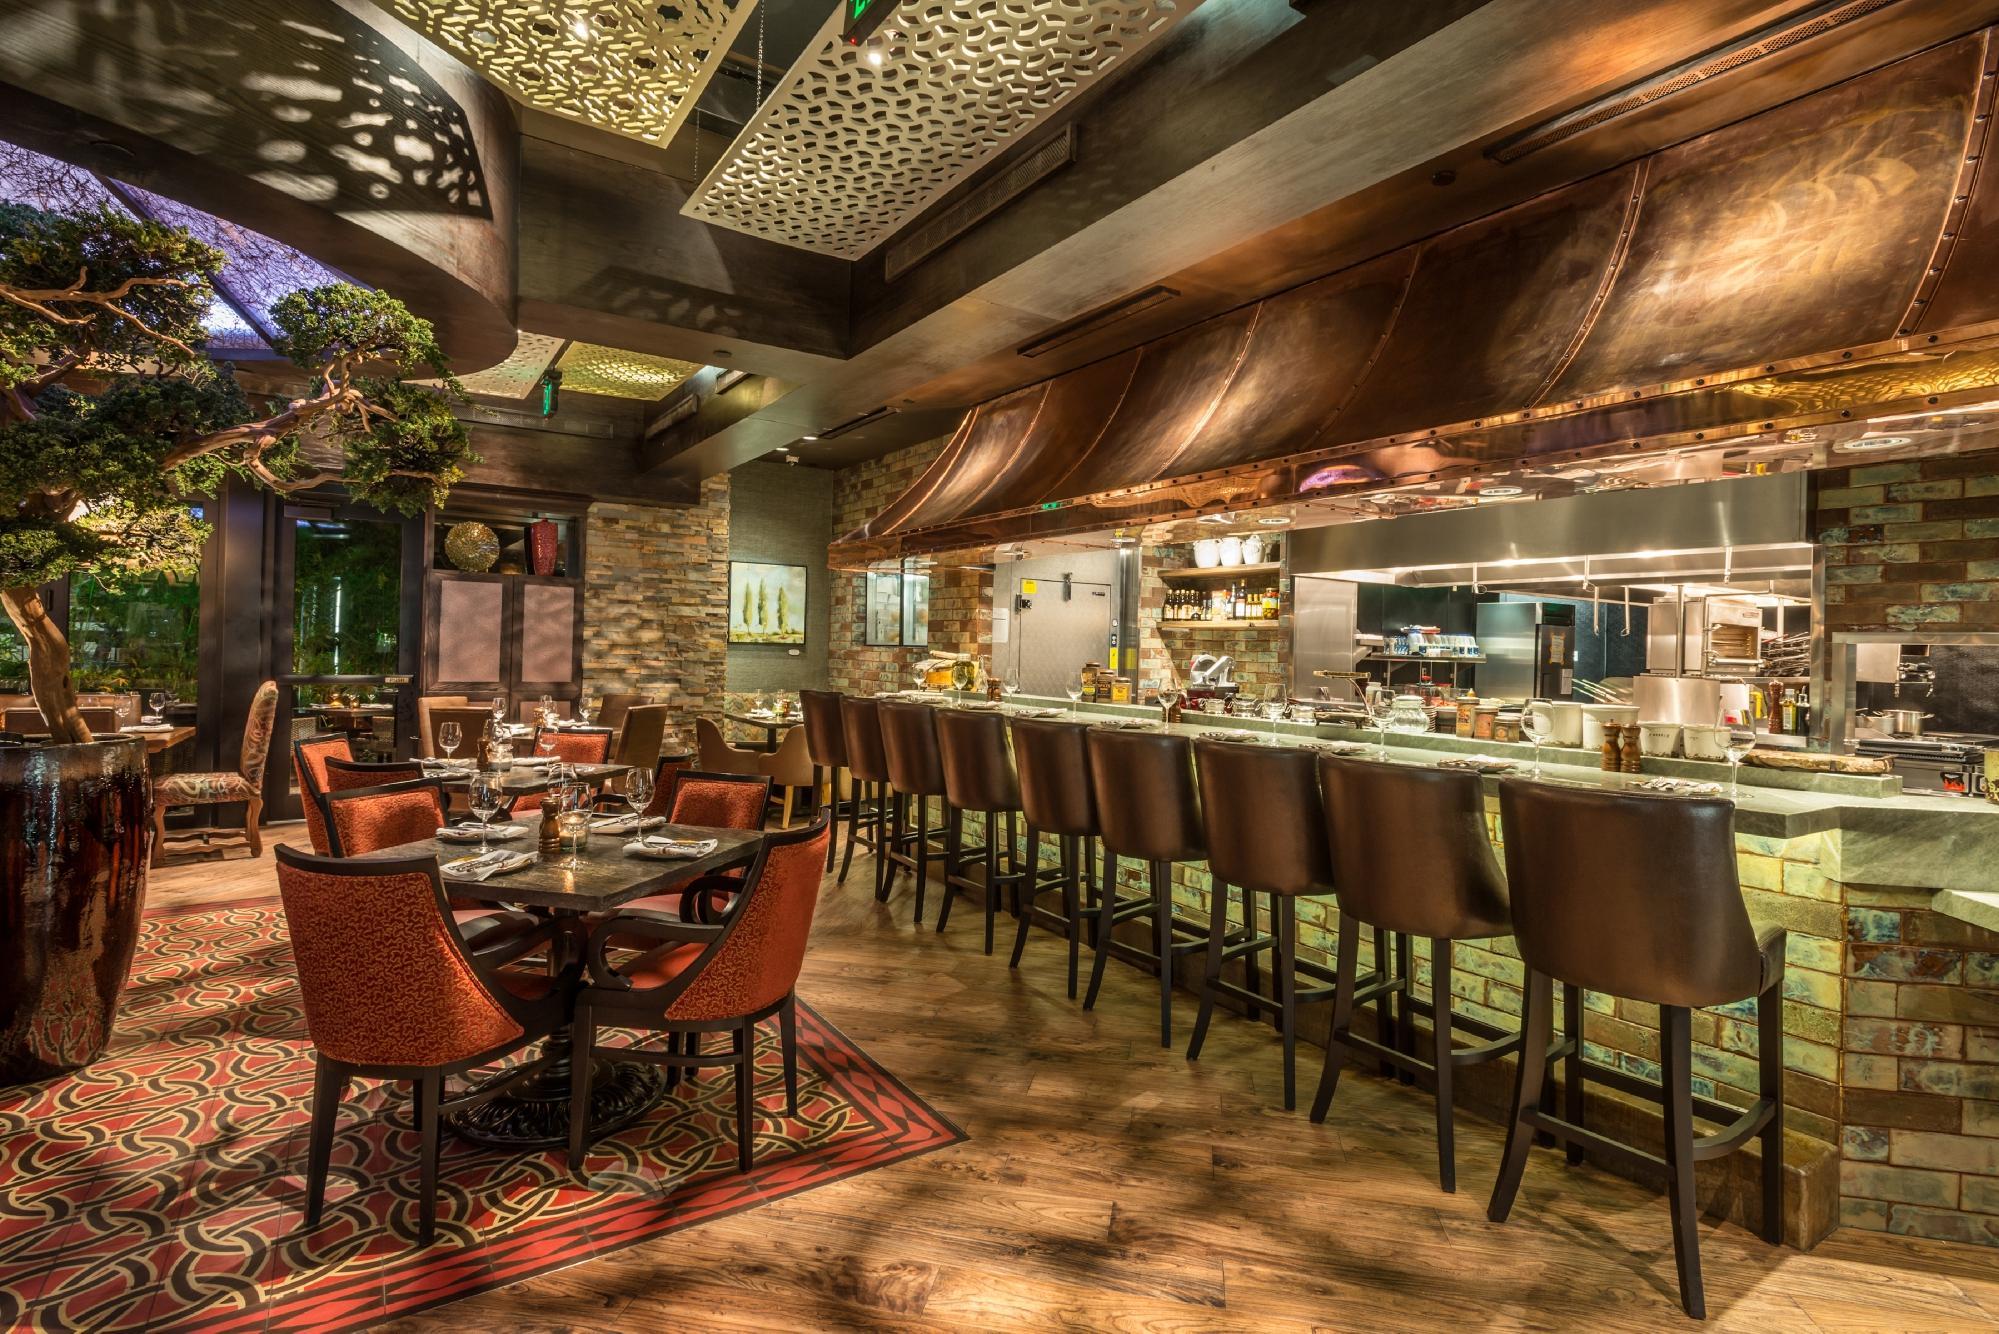 Tanzy 24 Of 666 Restaurants In Boca Raton